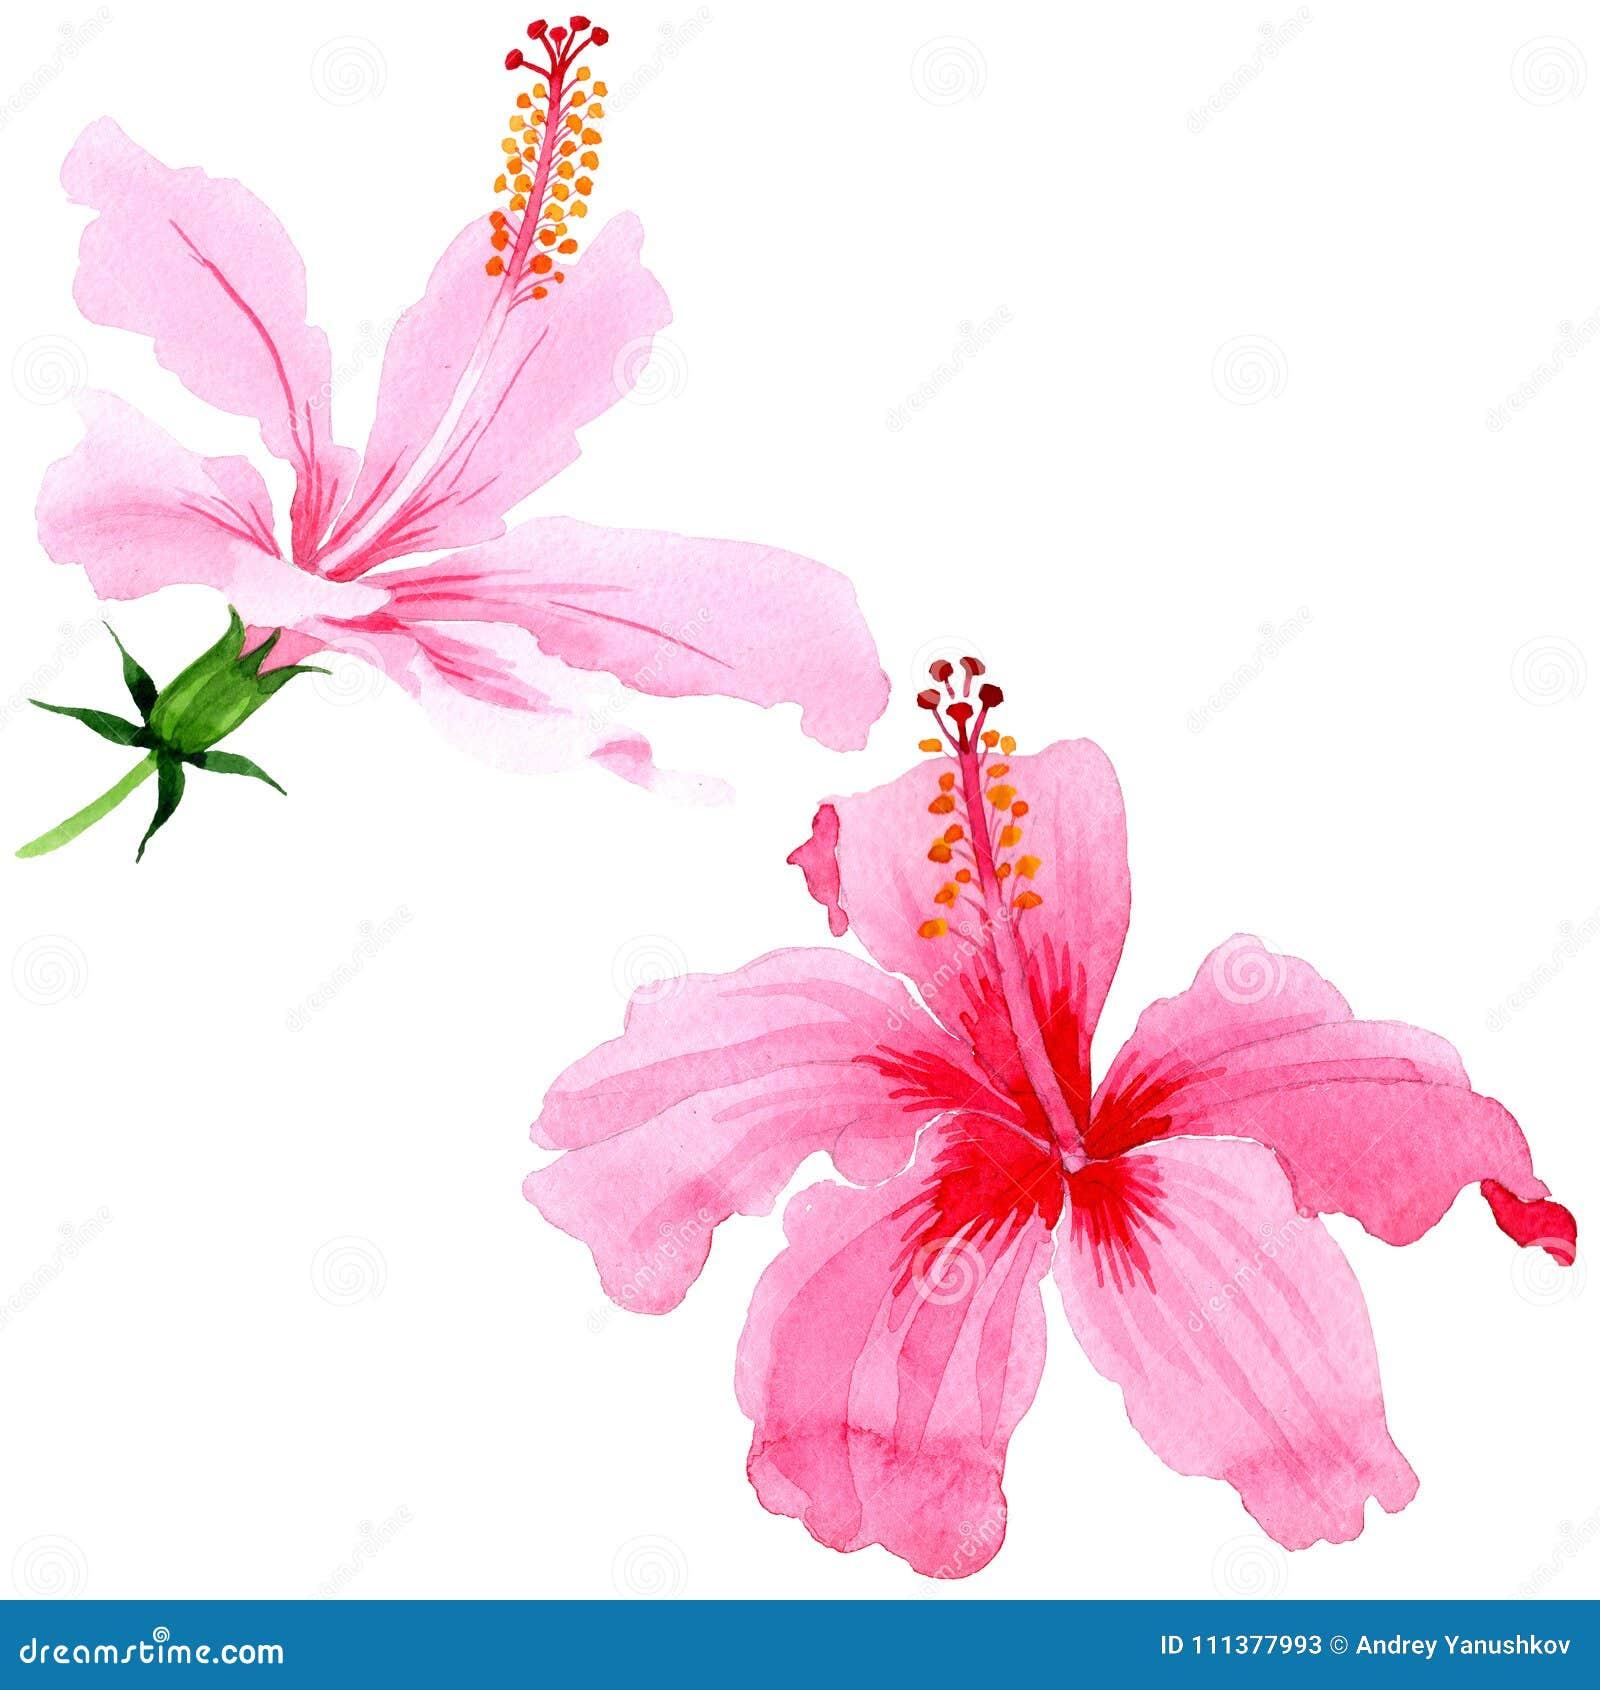 Wildflower hibiscus pink flower in a watercolor style isolated wildflower hibiscus pink flower in a watercolor style isolated full name of the plant hibiscus aquarelle wild flower for background texture mightylinksfo